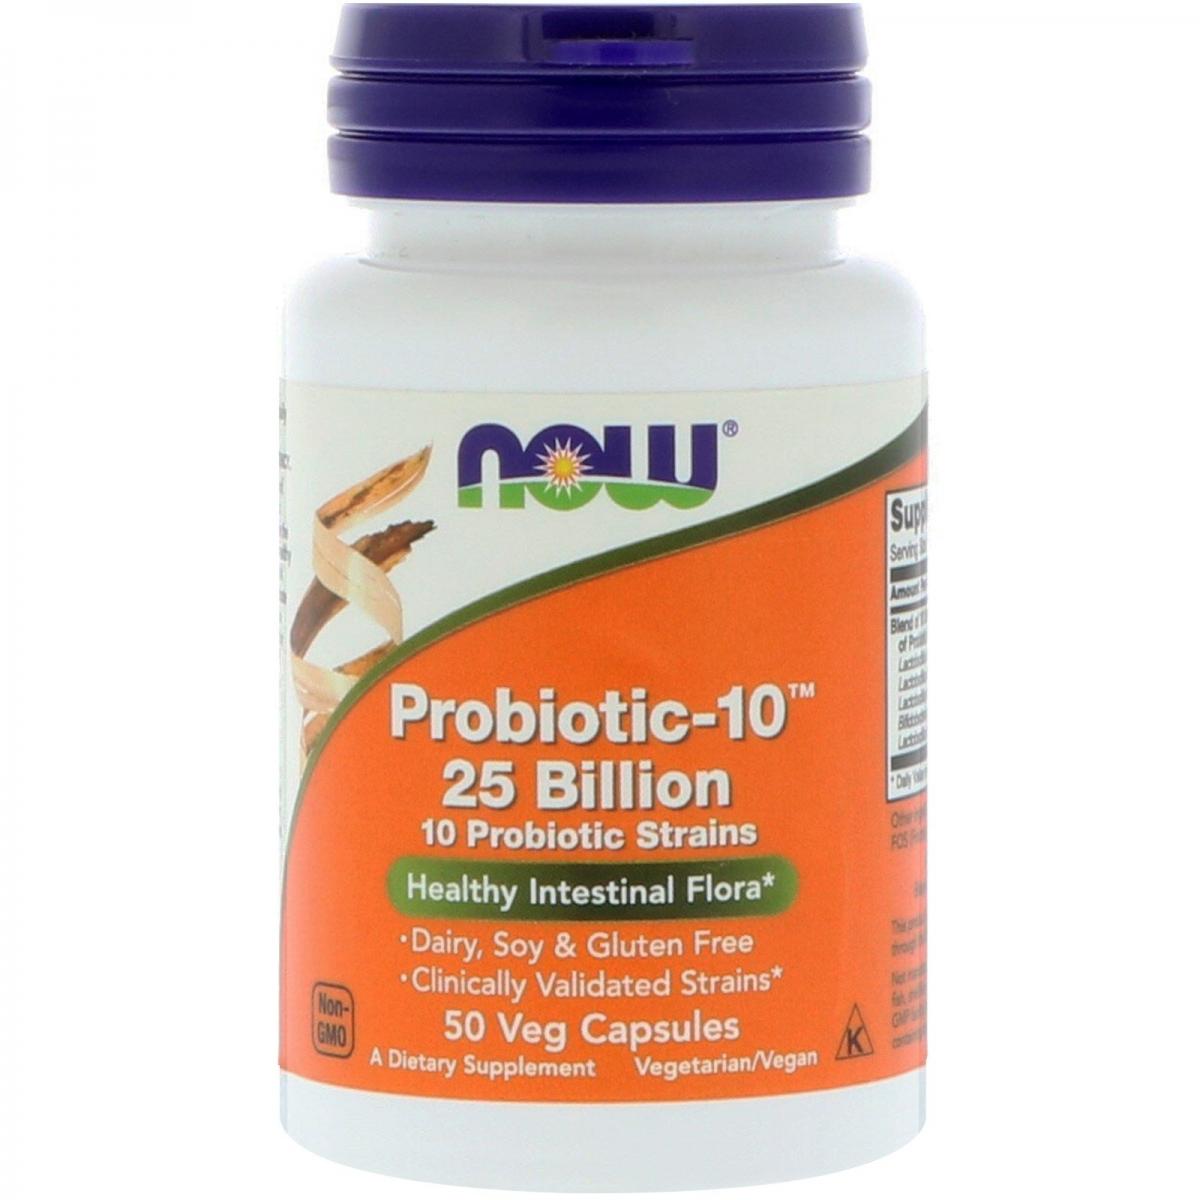 NOW Probiotic-10 25 Billion 50caps